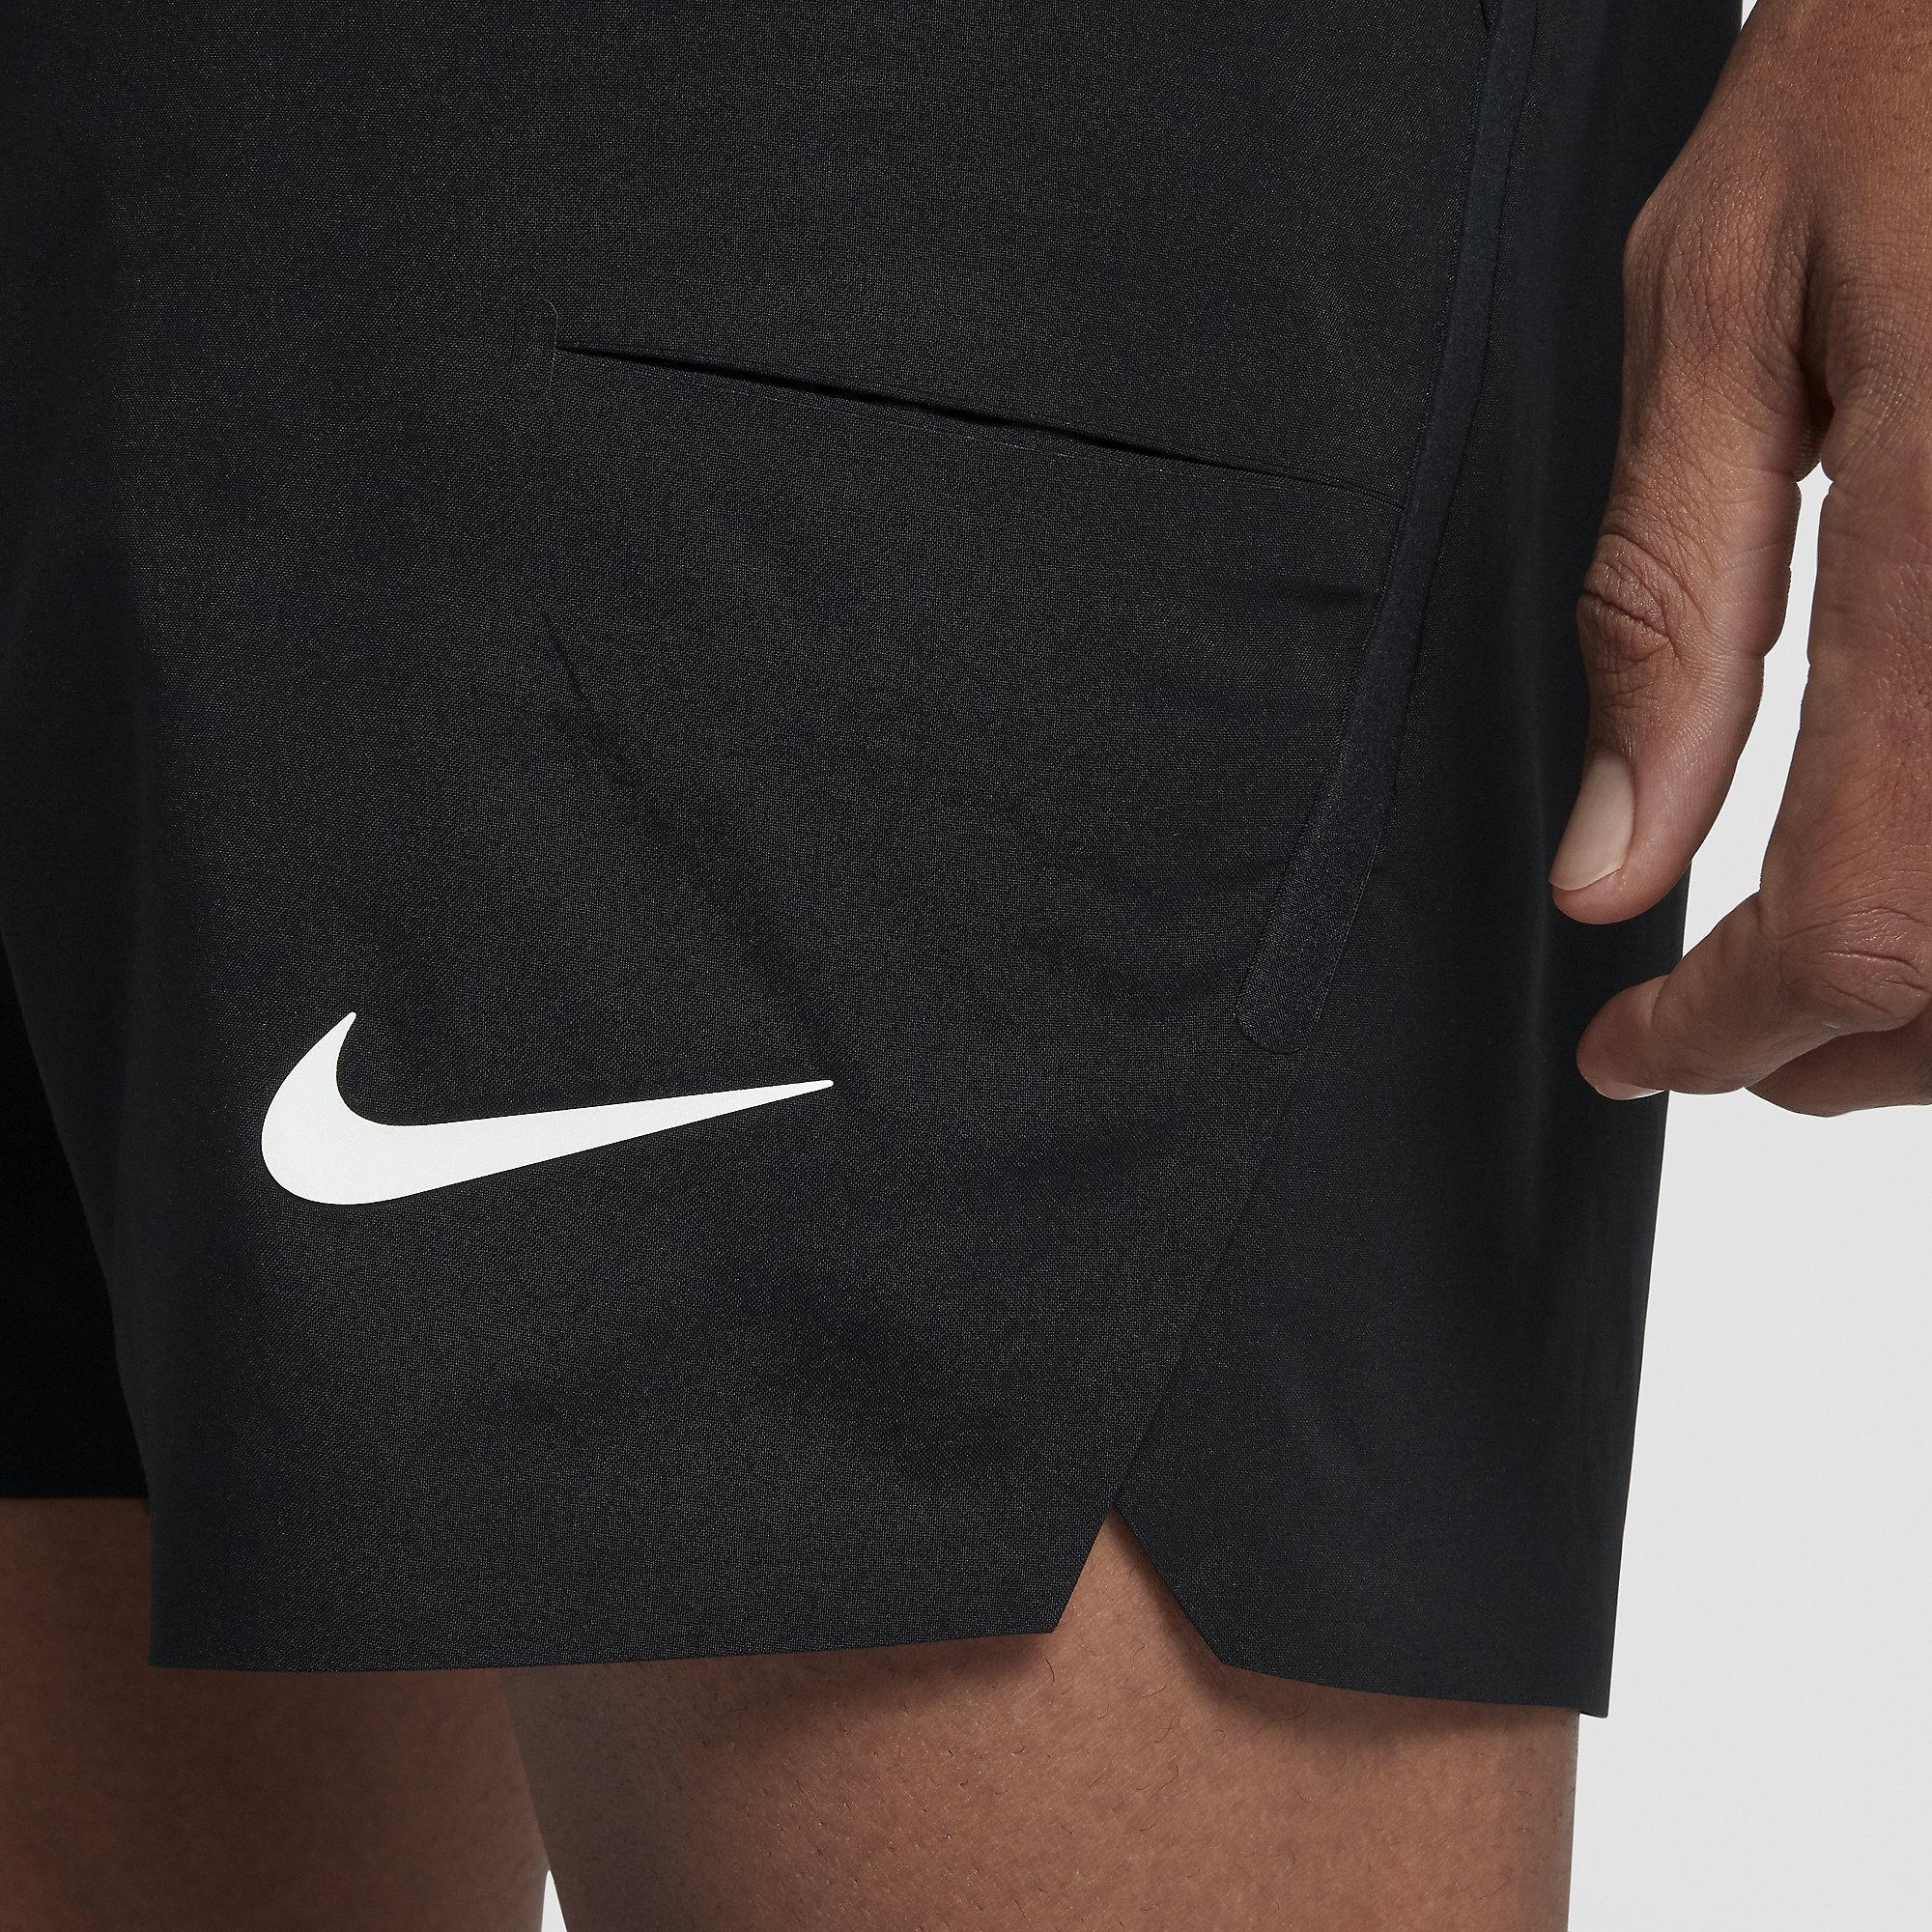 fbccc54f8420 Nike Mens Court Flex Ace 7 Inch Shorts - Black - Tennisnuts.com